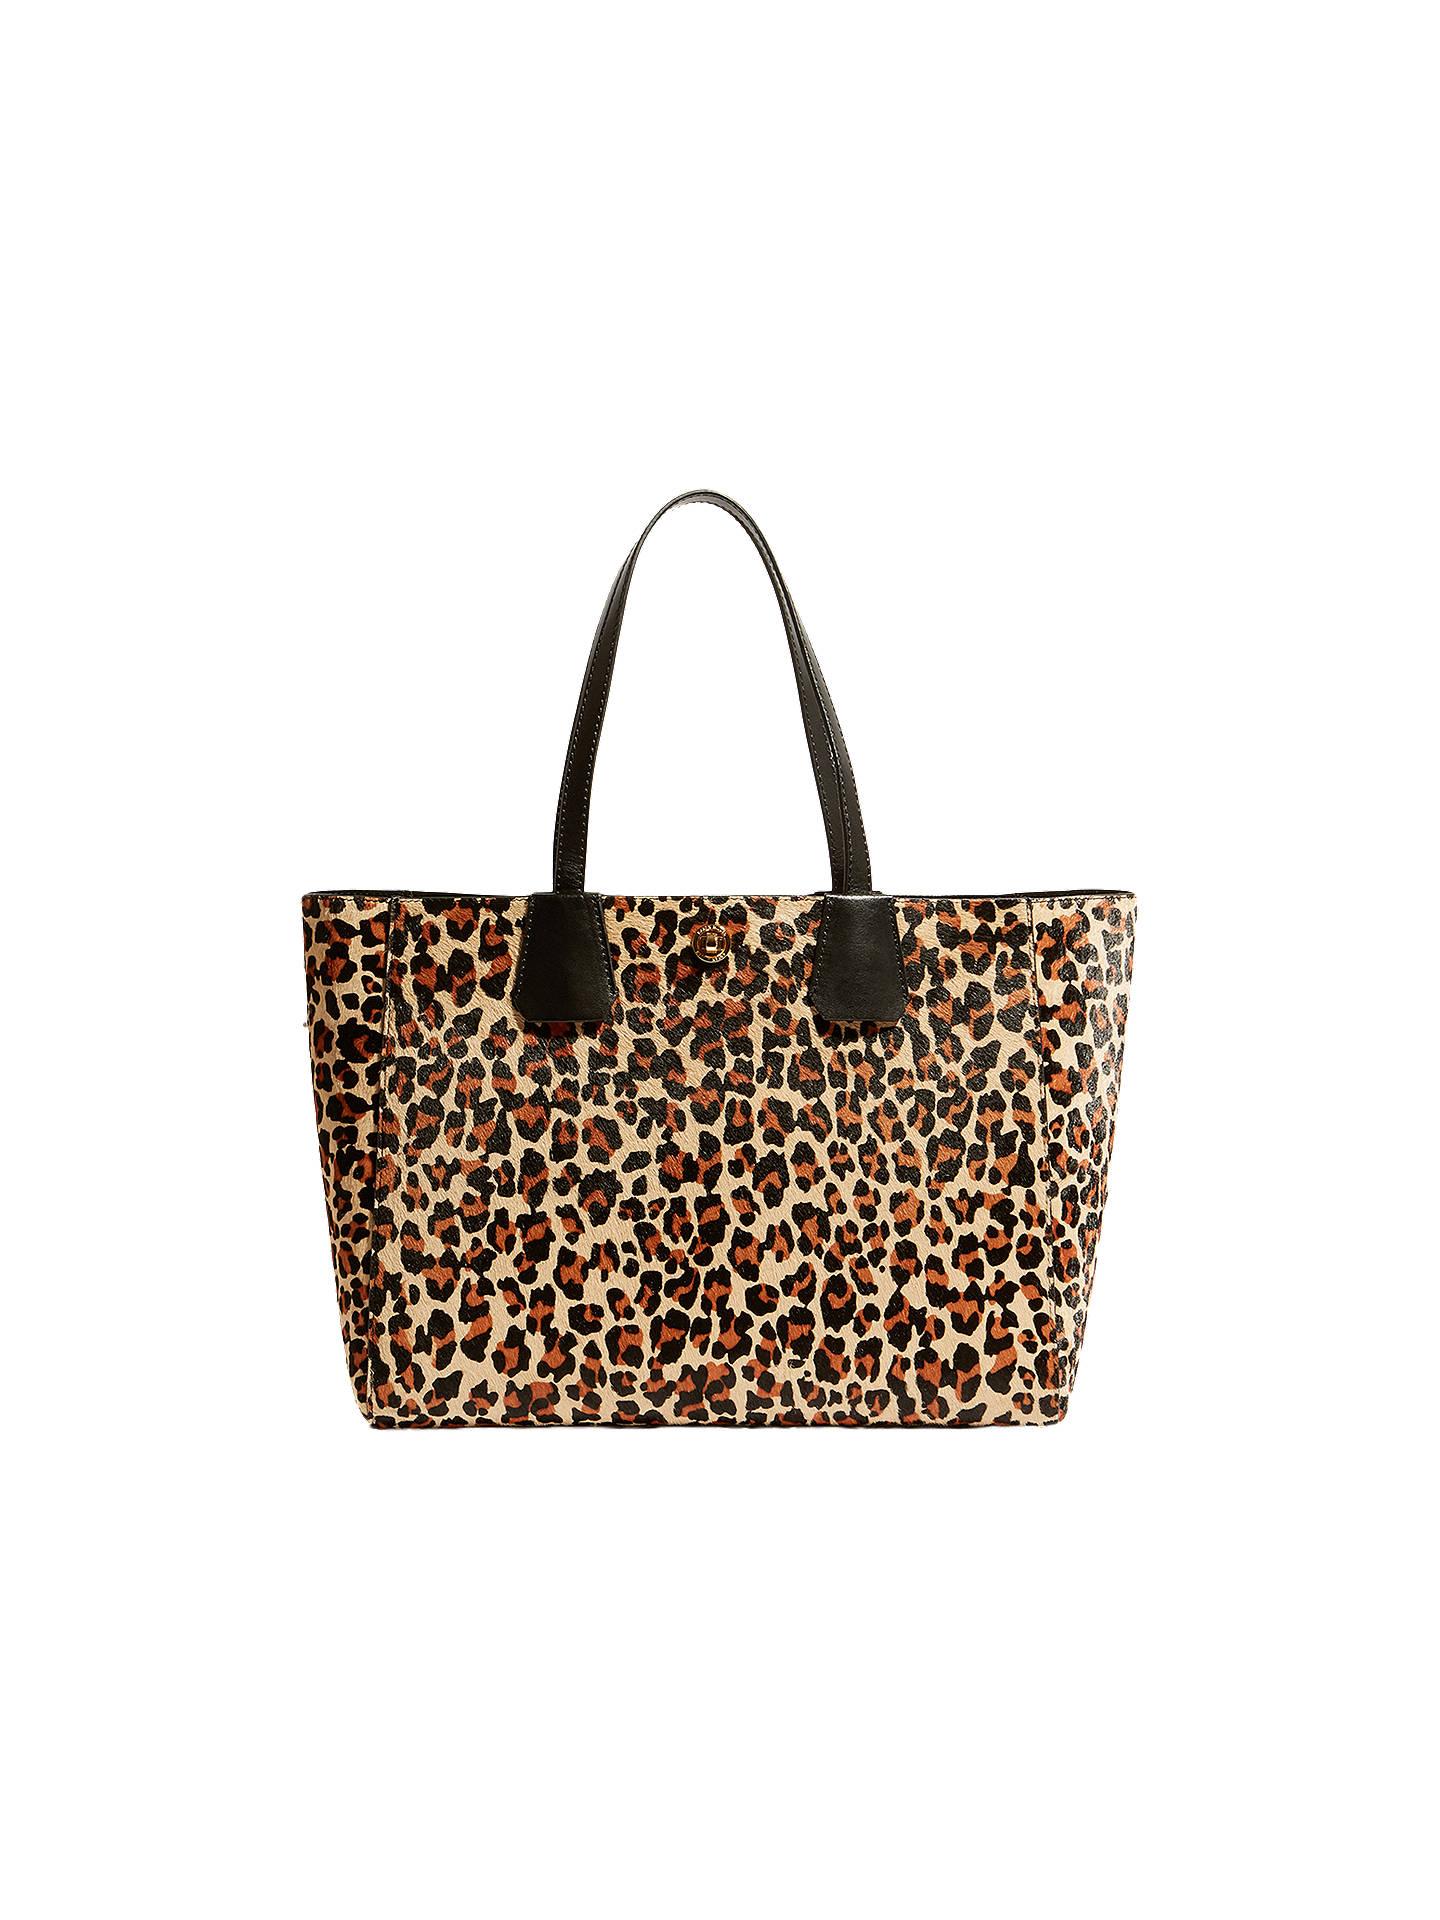 4fd17b5b79a3 Buy Karen Millen Leopard Print Tote Bag, Multi Online at johnlewis.com ...